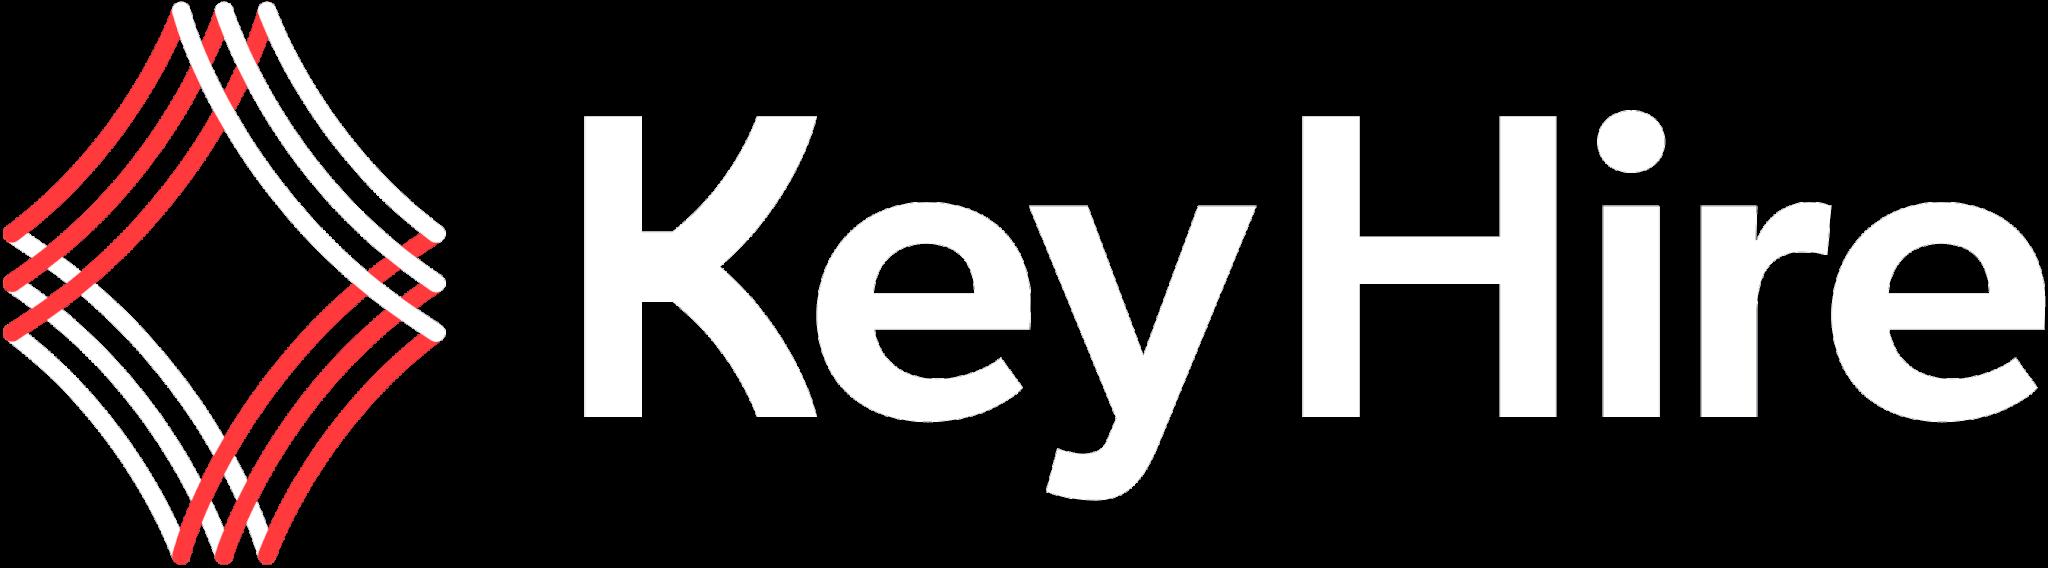 https://keyhire.io/wp-content/uploads/2021/06/logo-light.png